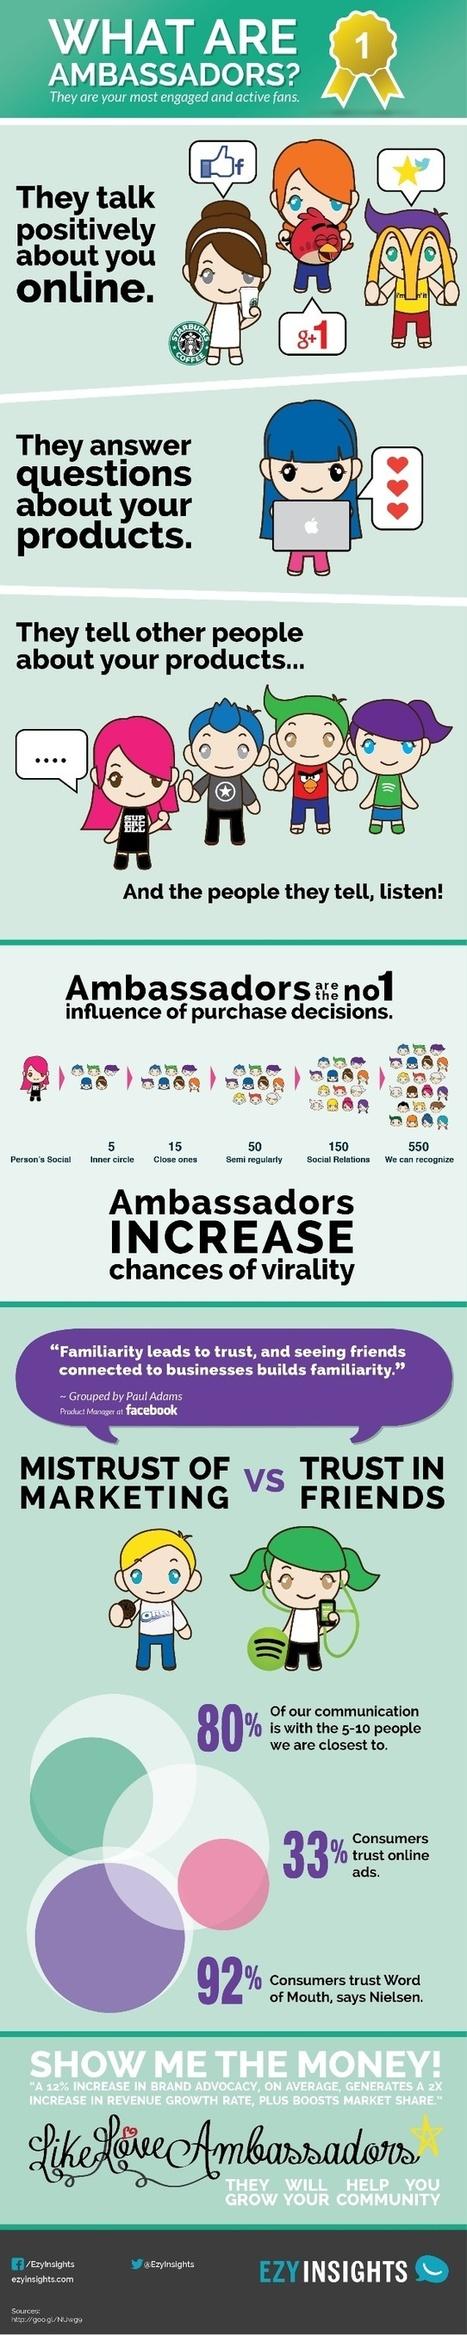 Embajadores de marca en Redes Sociales #infografia #infographic #marketing #socialmedia | Seo, Social Media Marketing | Scoop.it